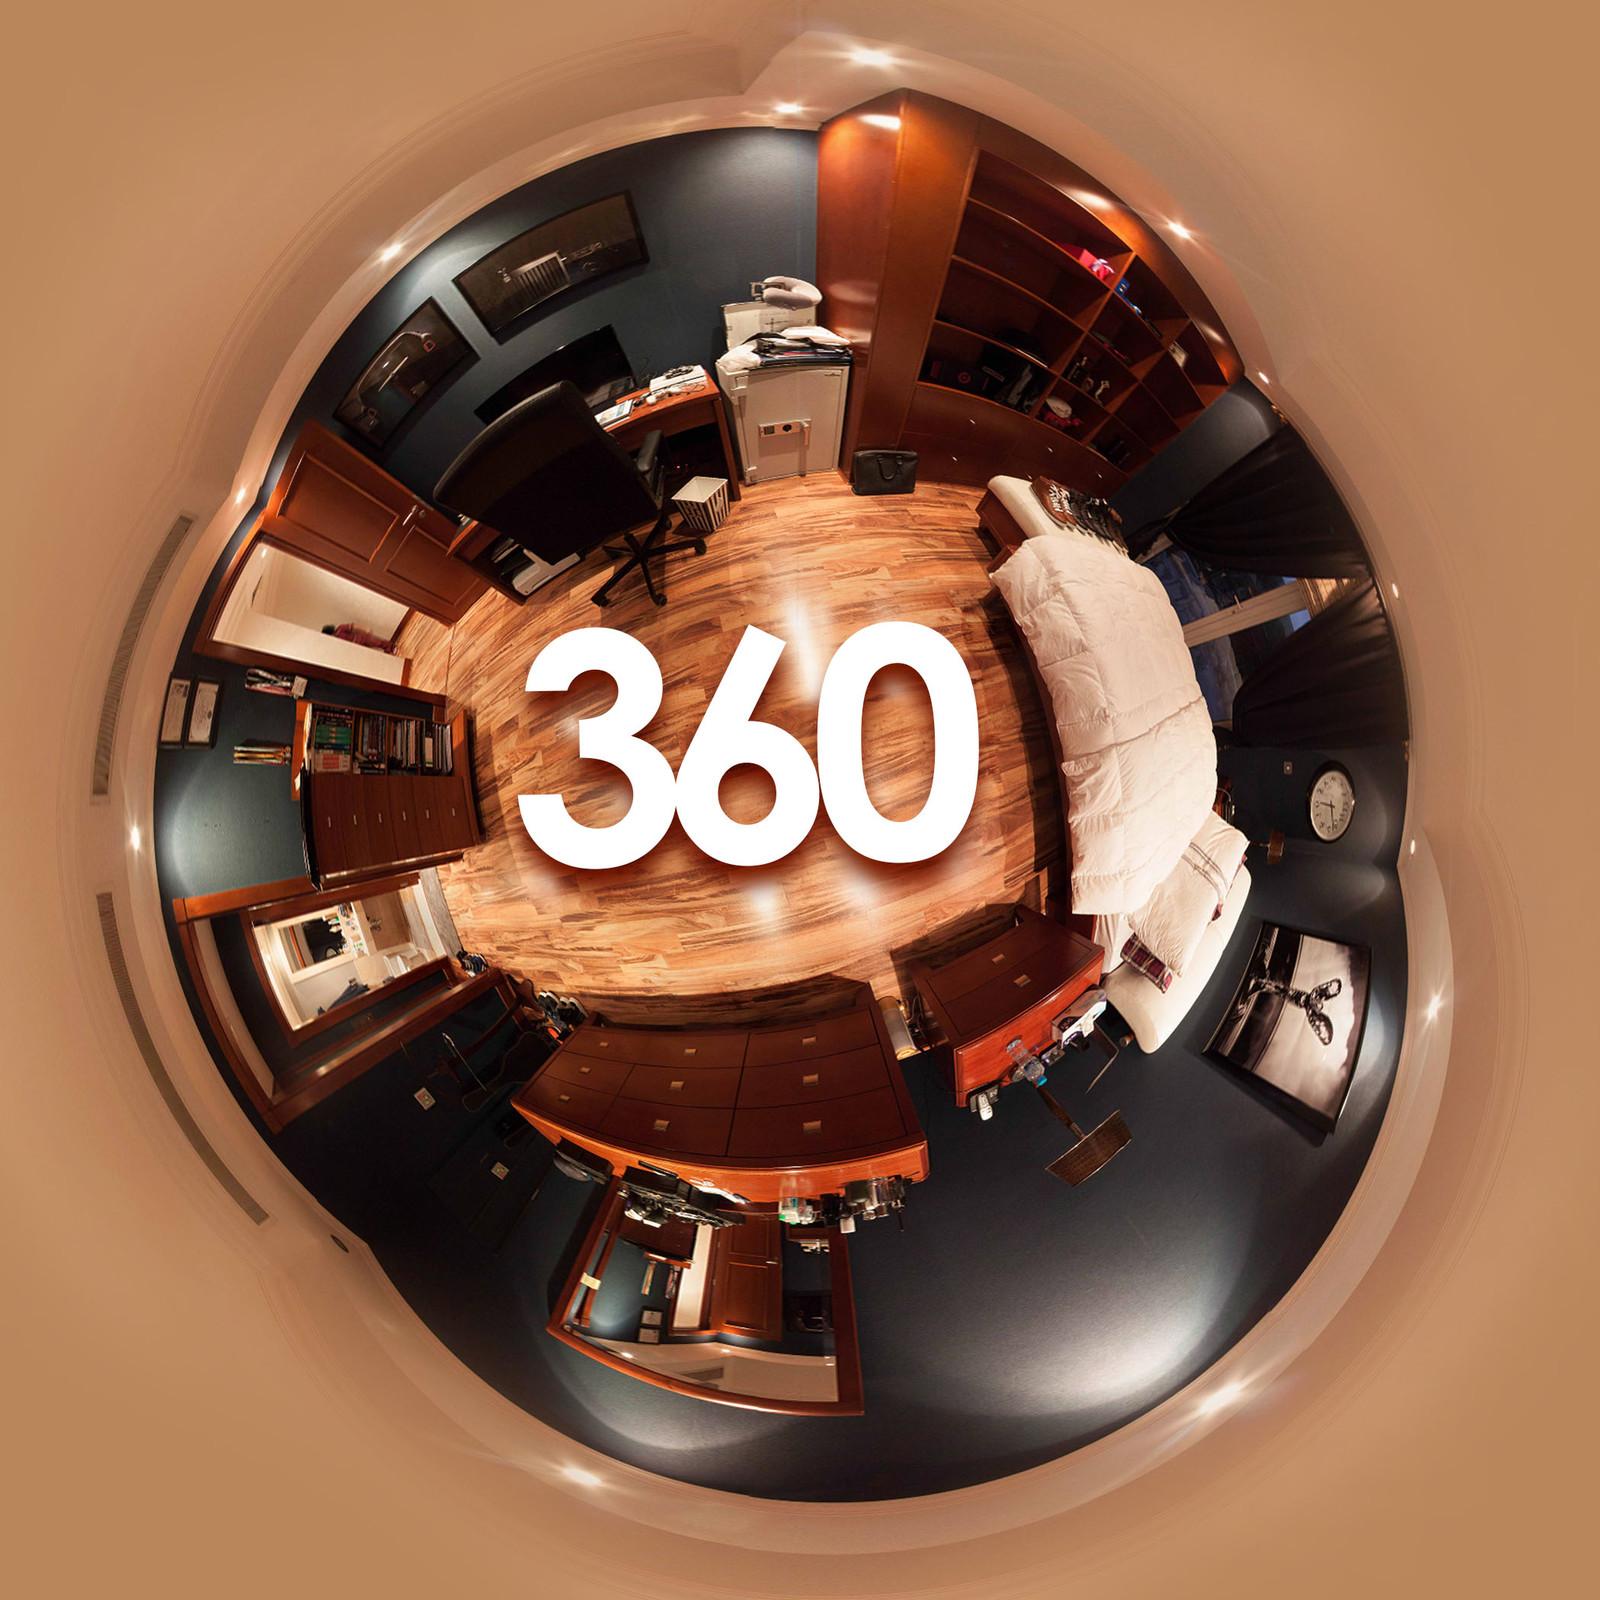 360 Panorama Works